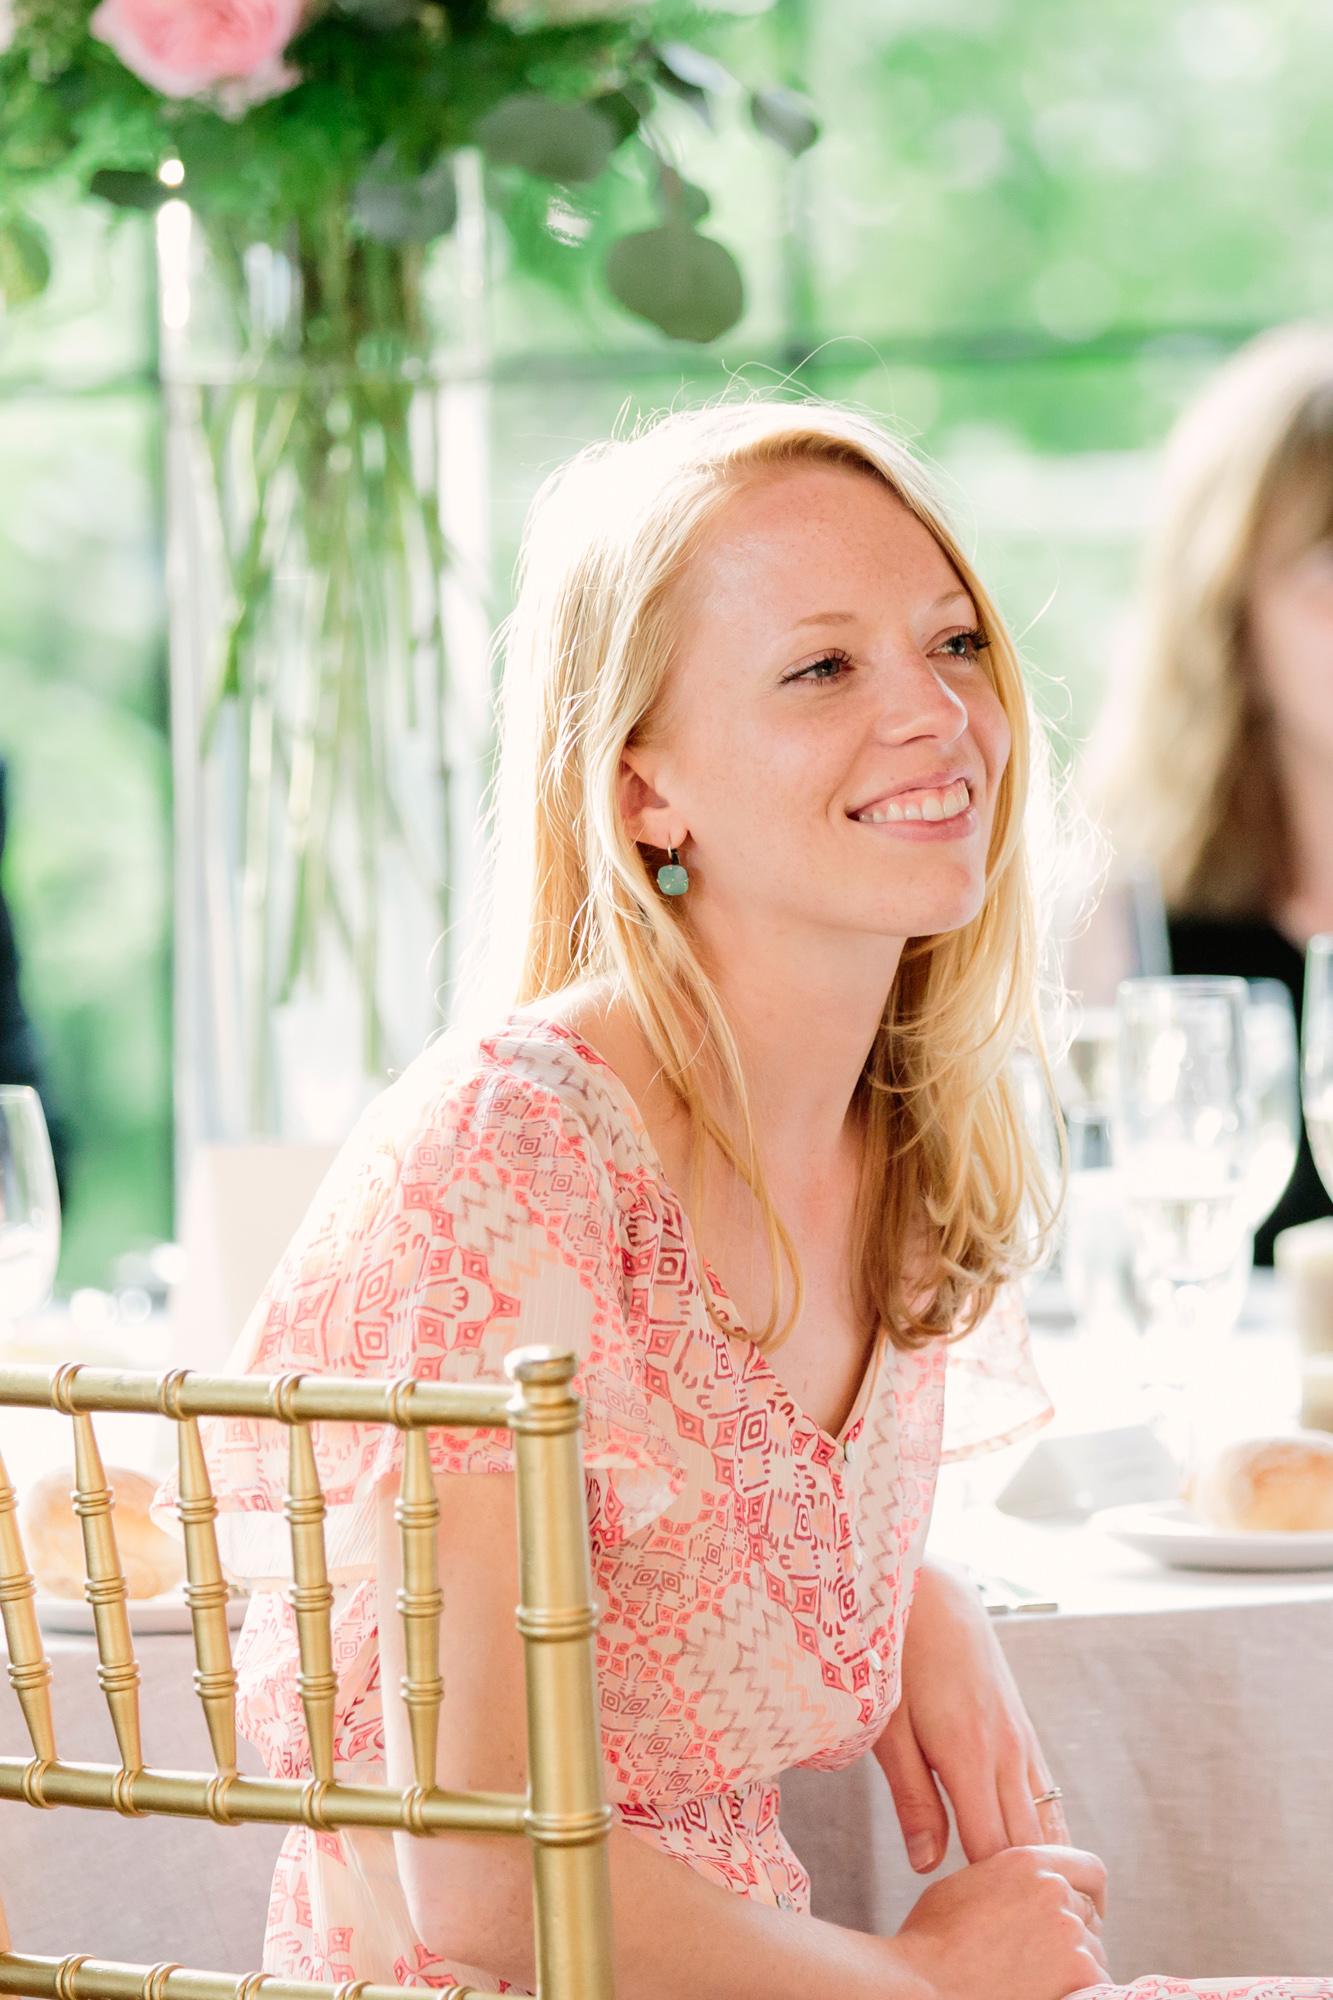 68_Rowan_Brian_The_Roundhouse_Wedding_Beacon_NY_Tanya_Salazar_Photography_744.jpg